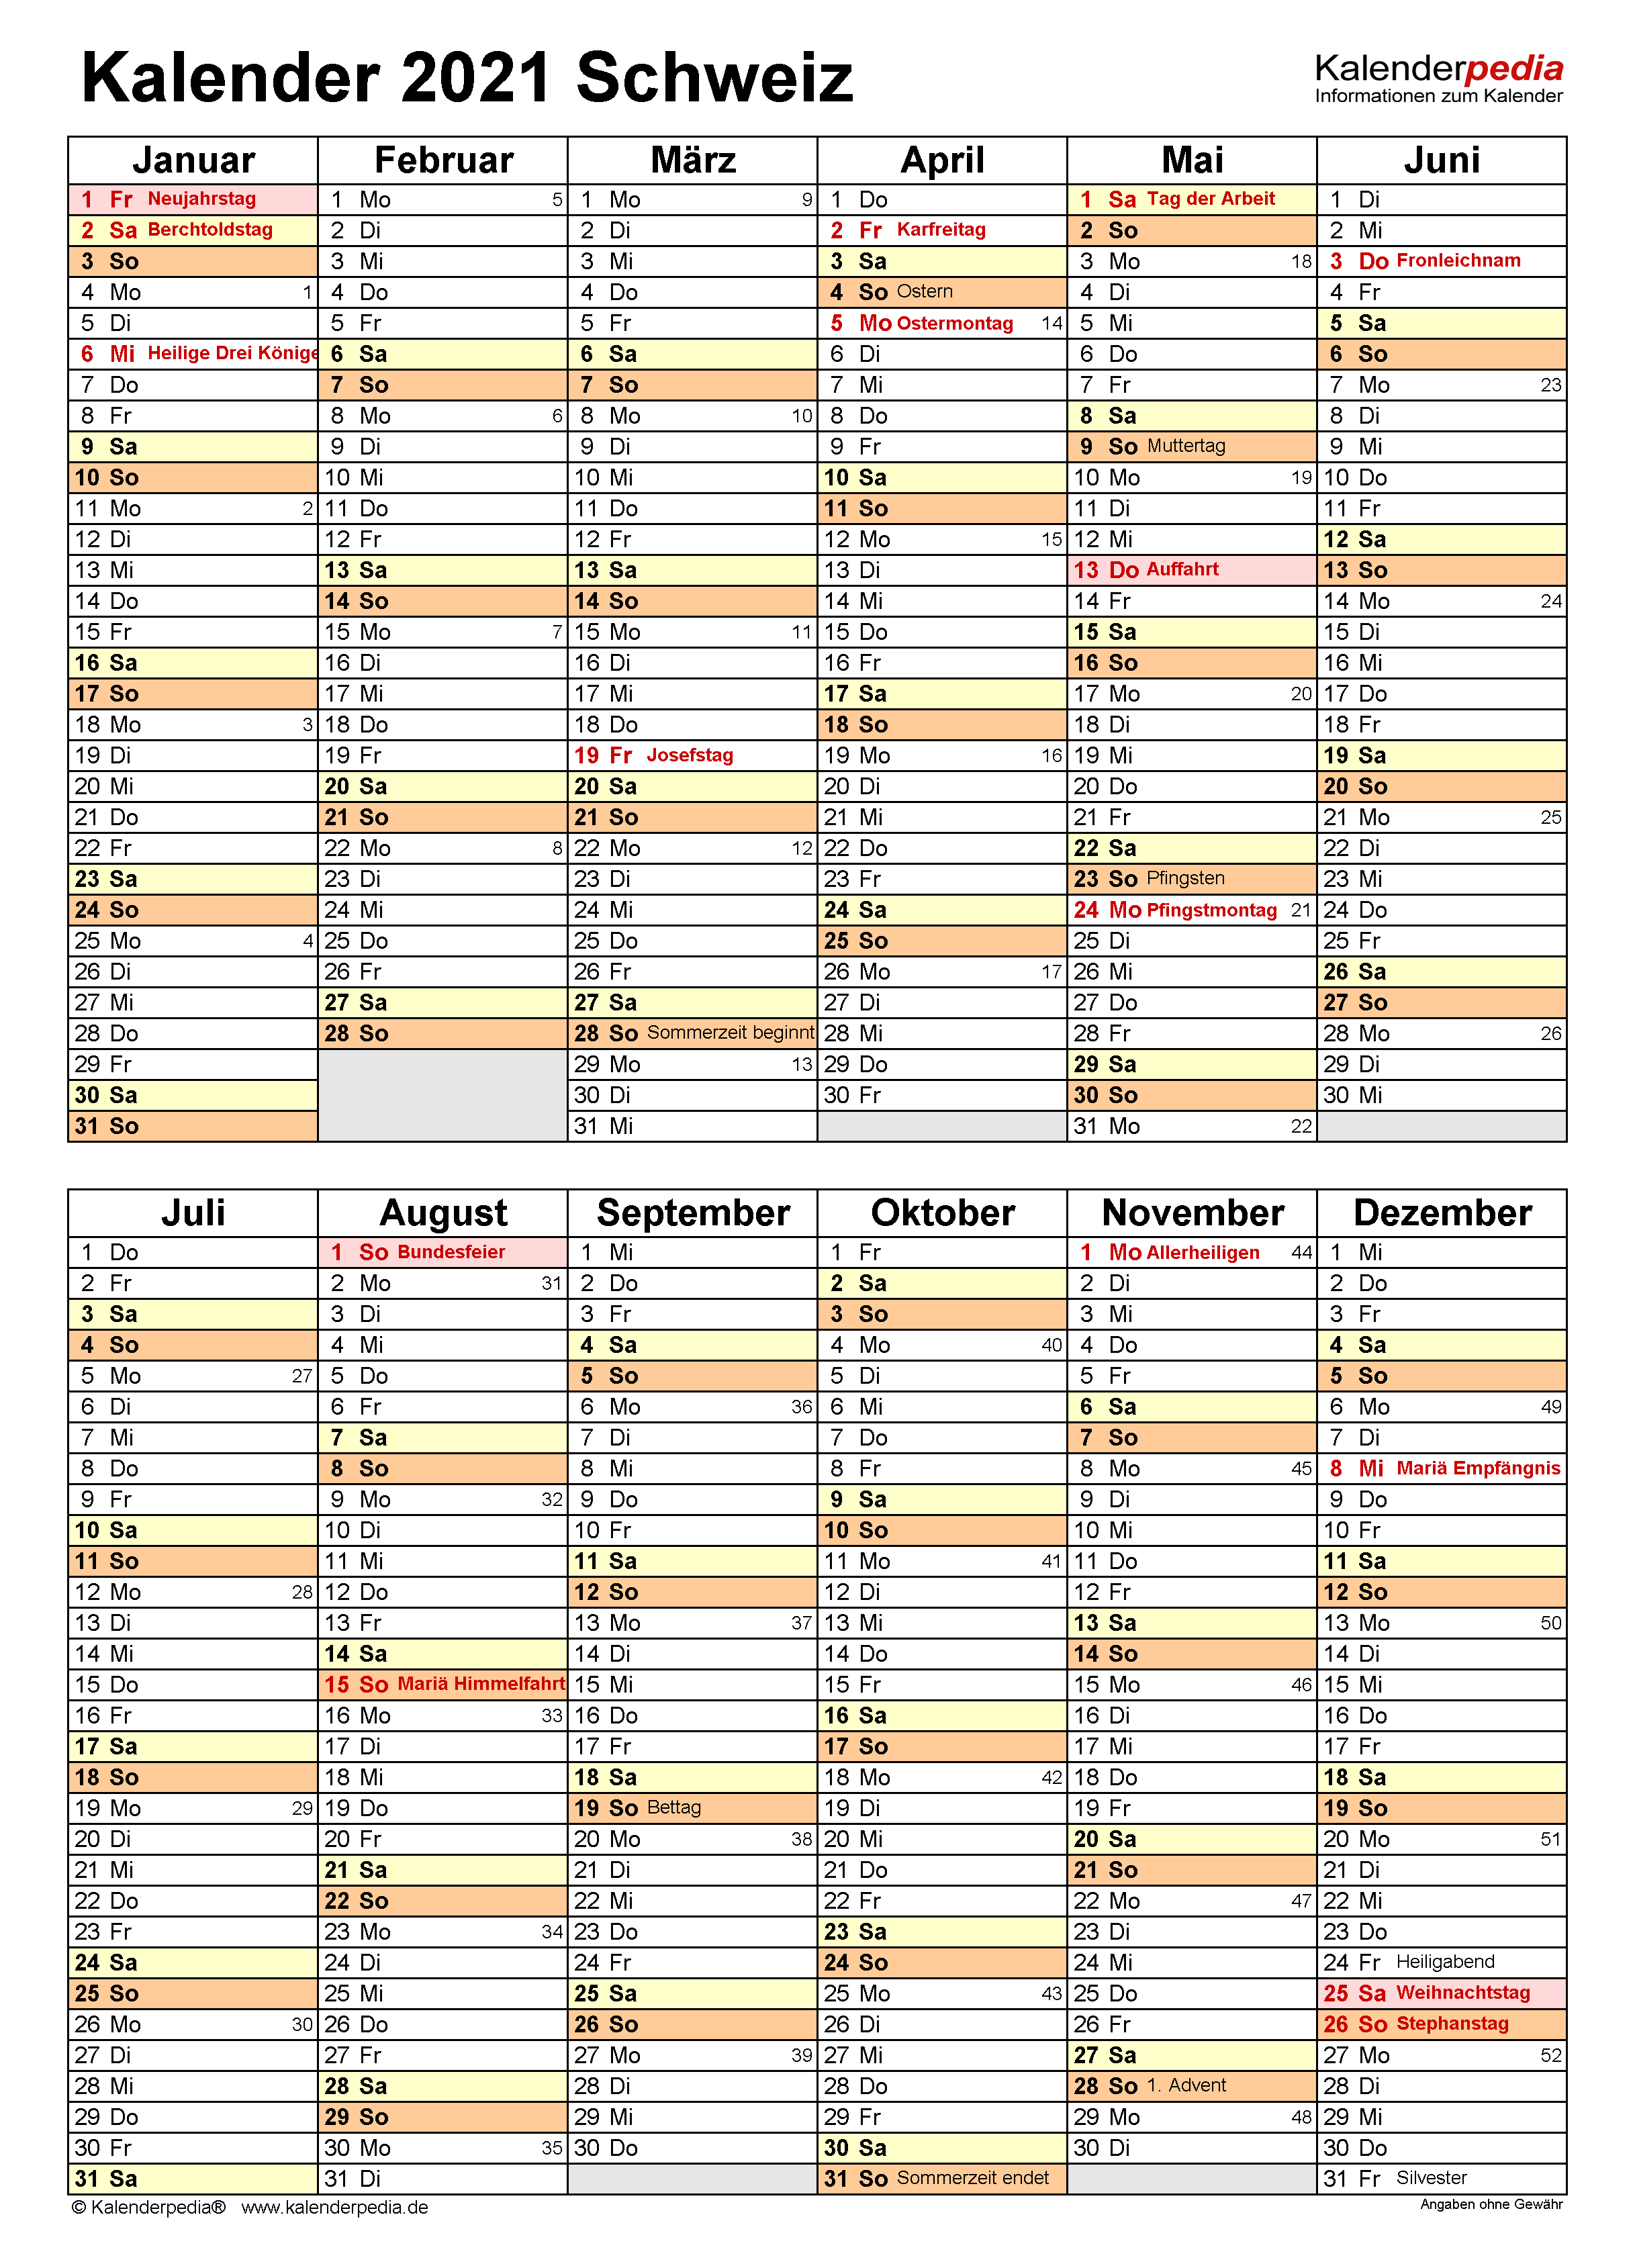 convertidor gratis de pdf a word 2007